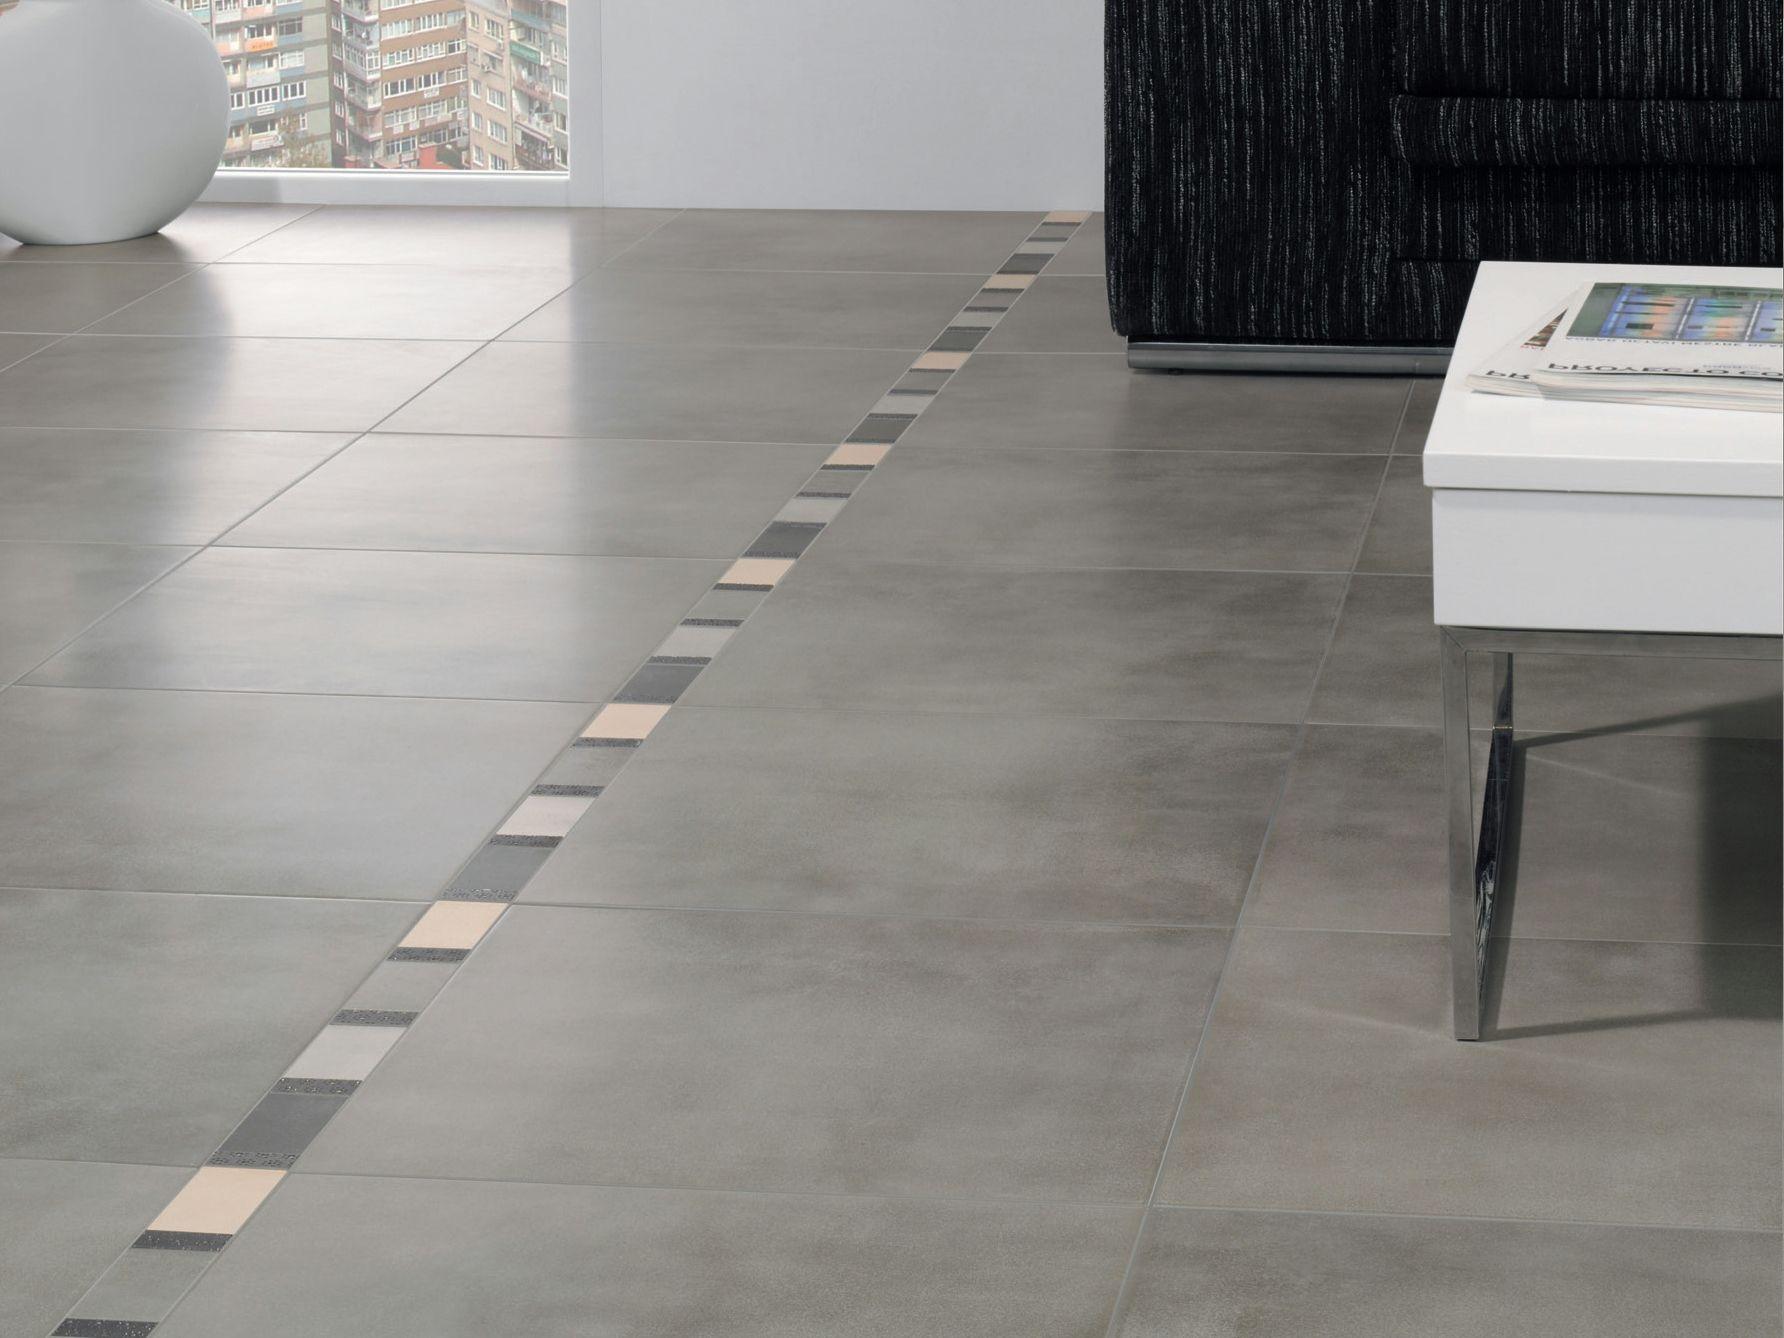 Pavimento de gres porcel nico para interiores y exteriores for Baldosas para pisos interiores